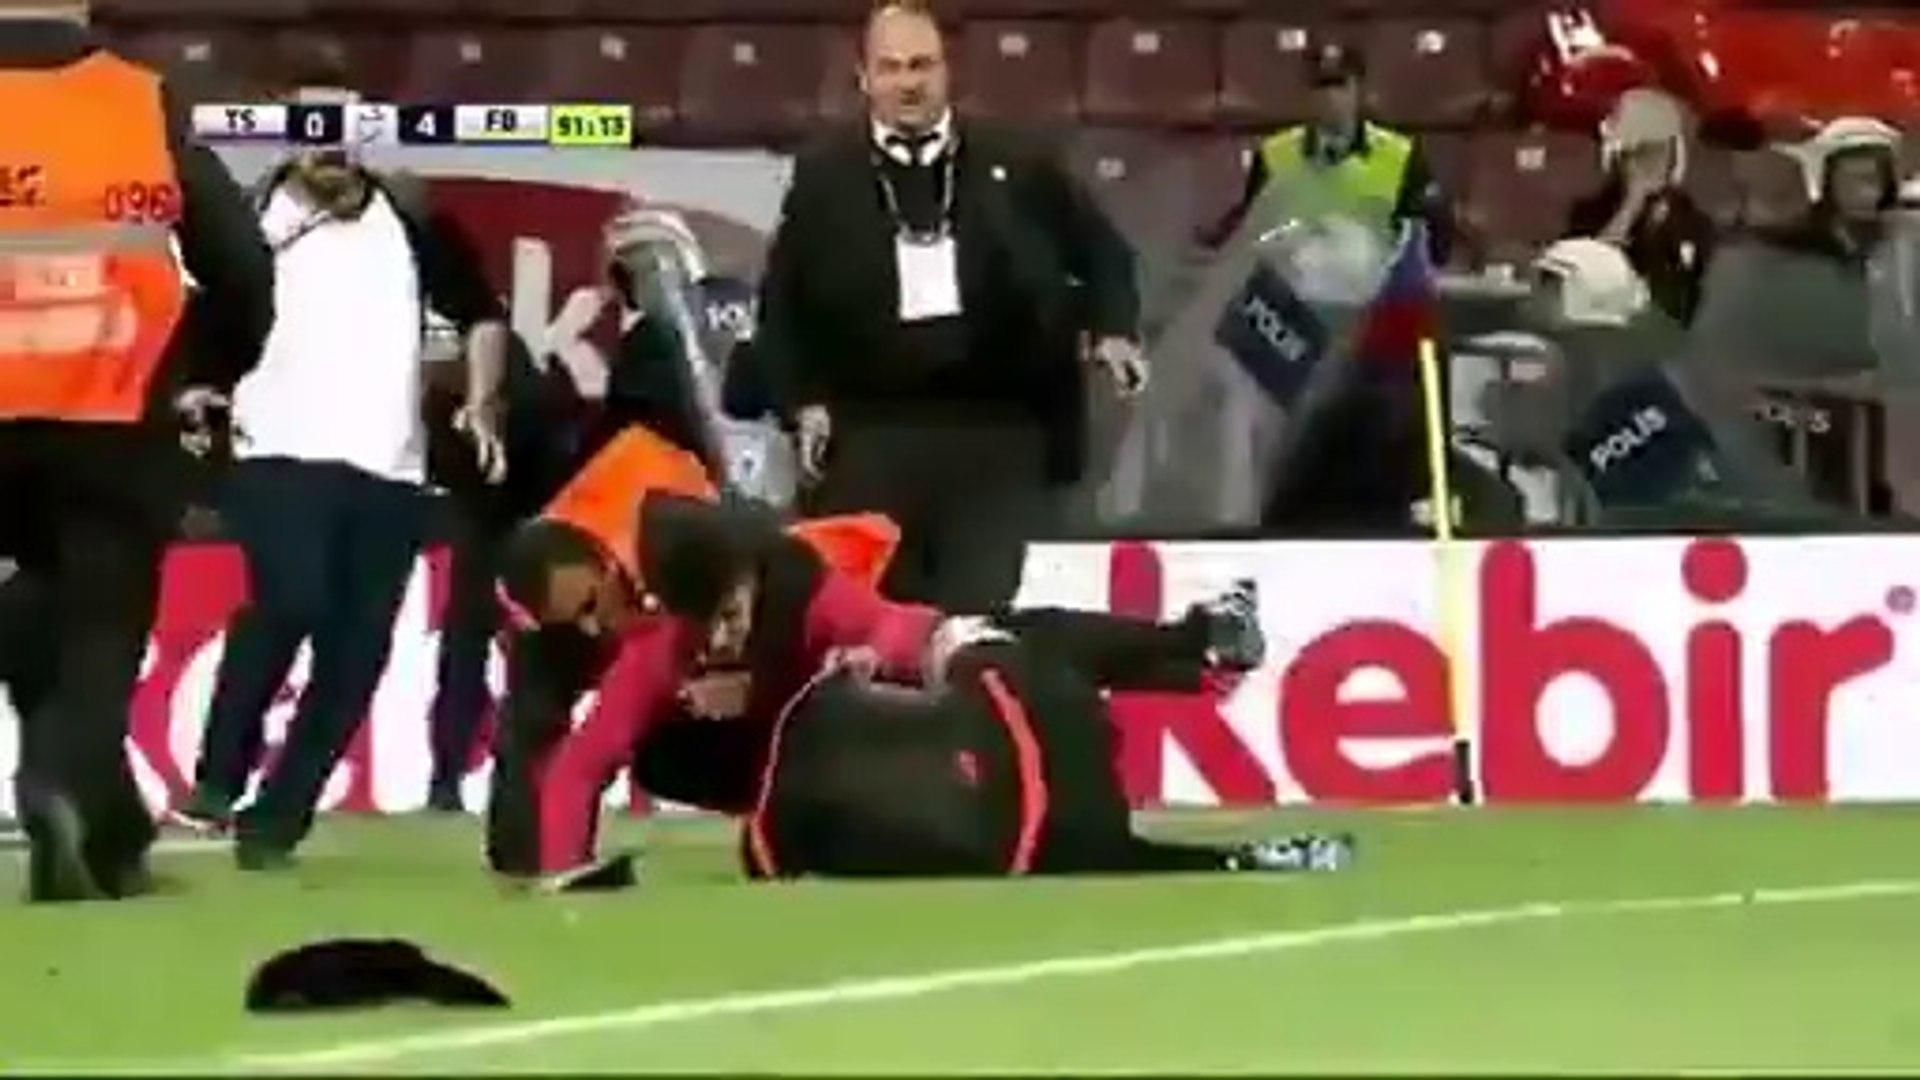 excellent sport